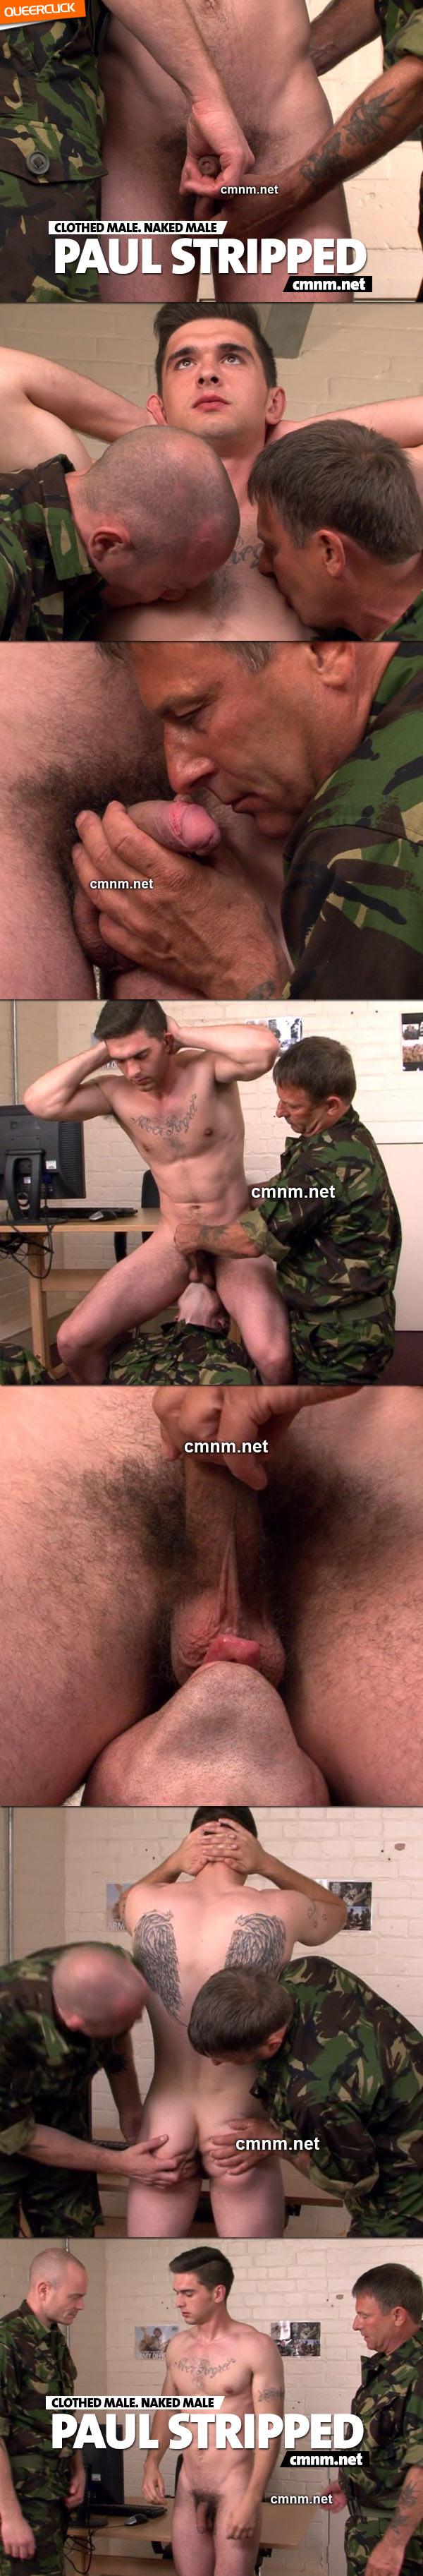 CMNM.net - Paul Stripped